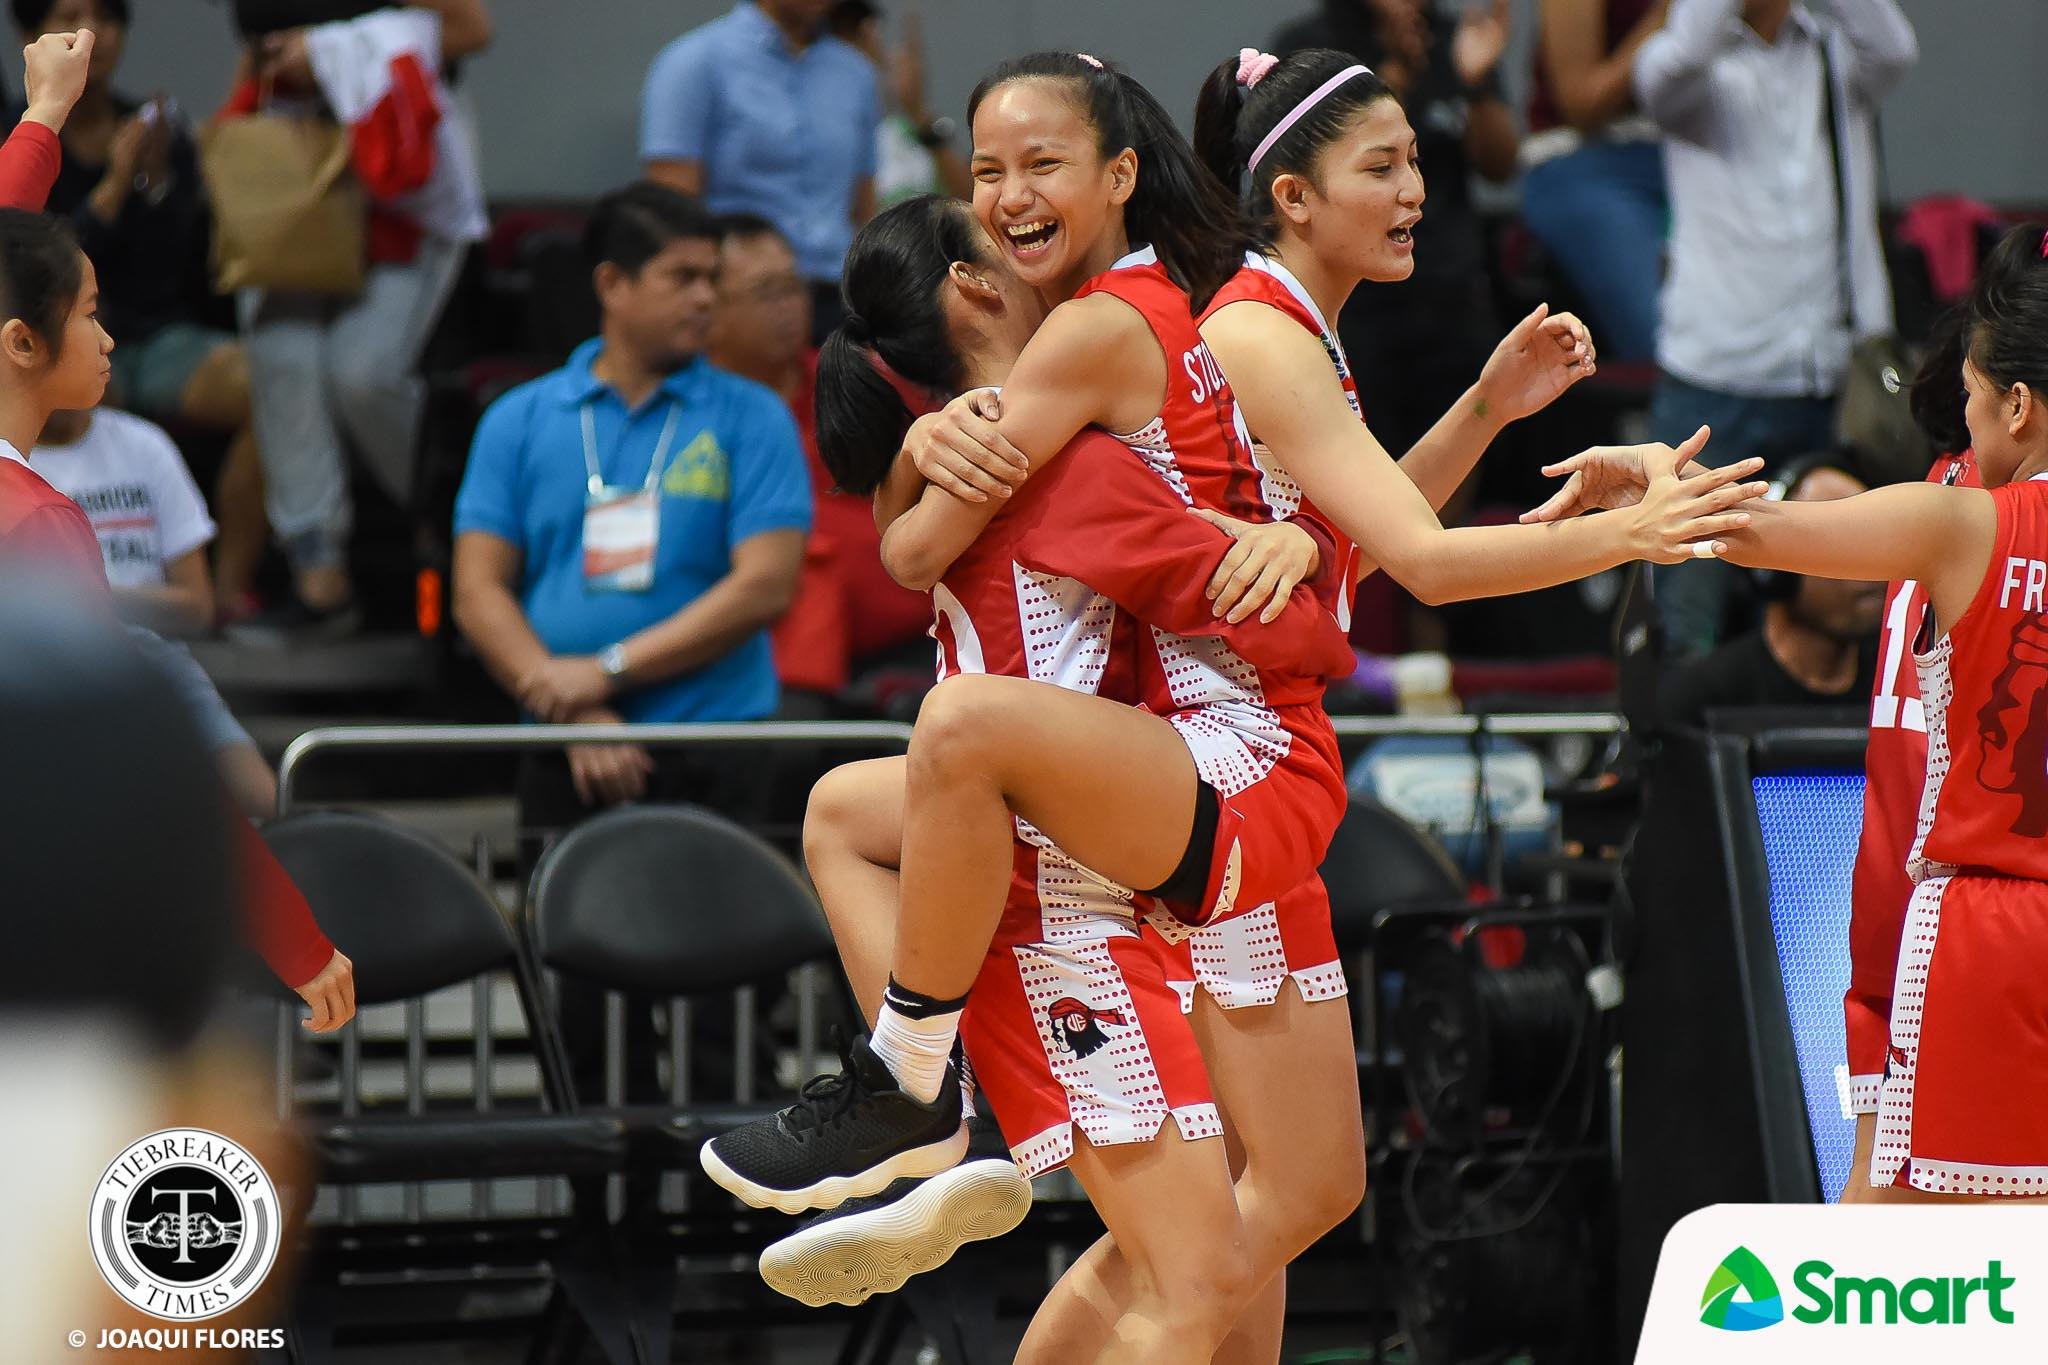 UAAP-80-UE-vs.-UST-Sto.-Domingo-9445 Graduating seniors, Aileen Lebornio laud valiant UE after Finals loss to NU Basketball News UAAP UE  - philippine sports news